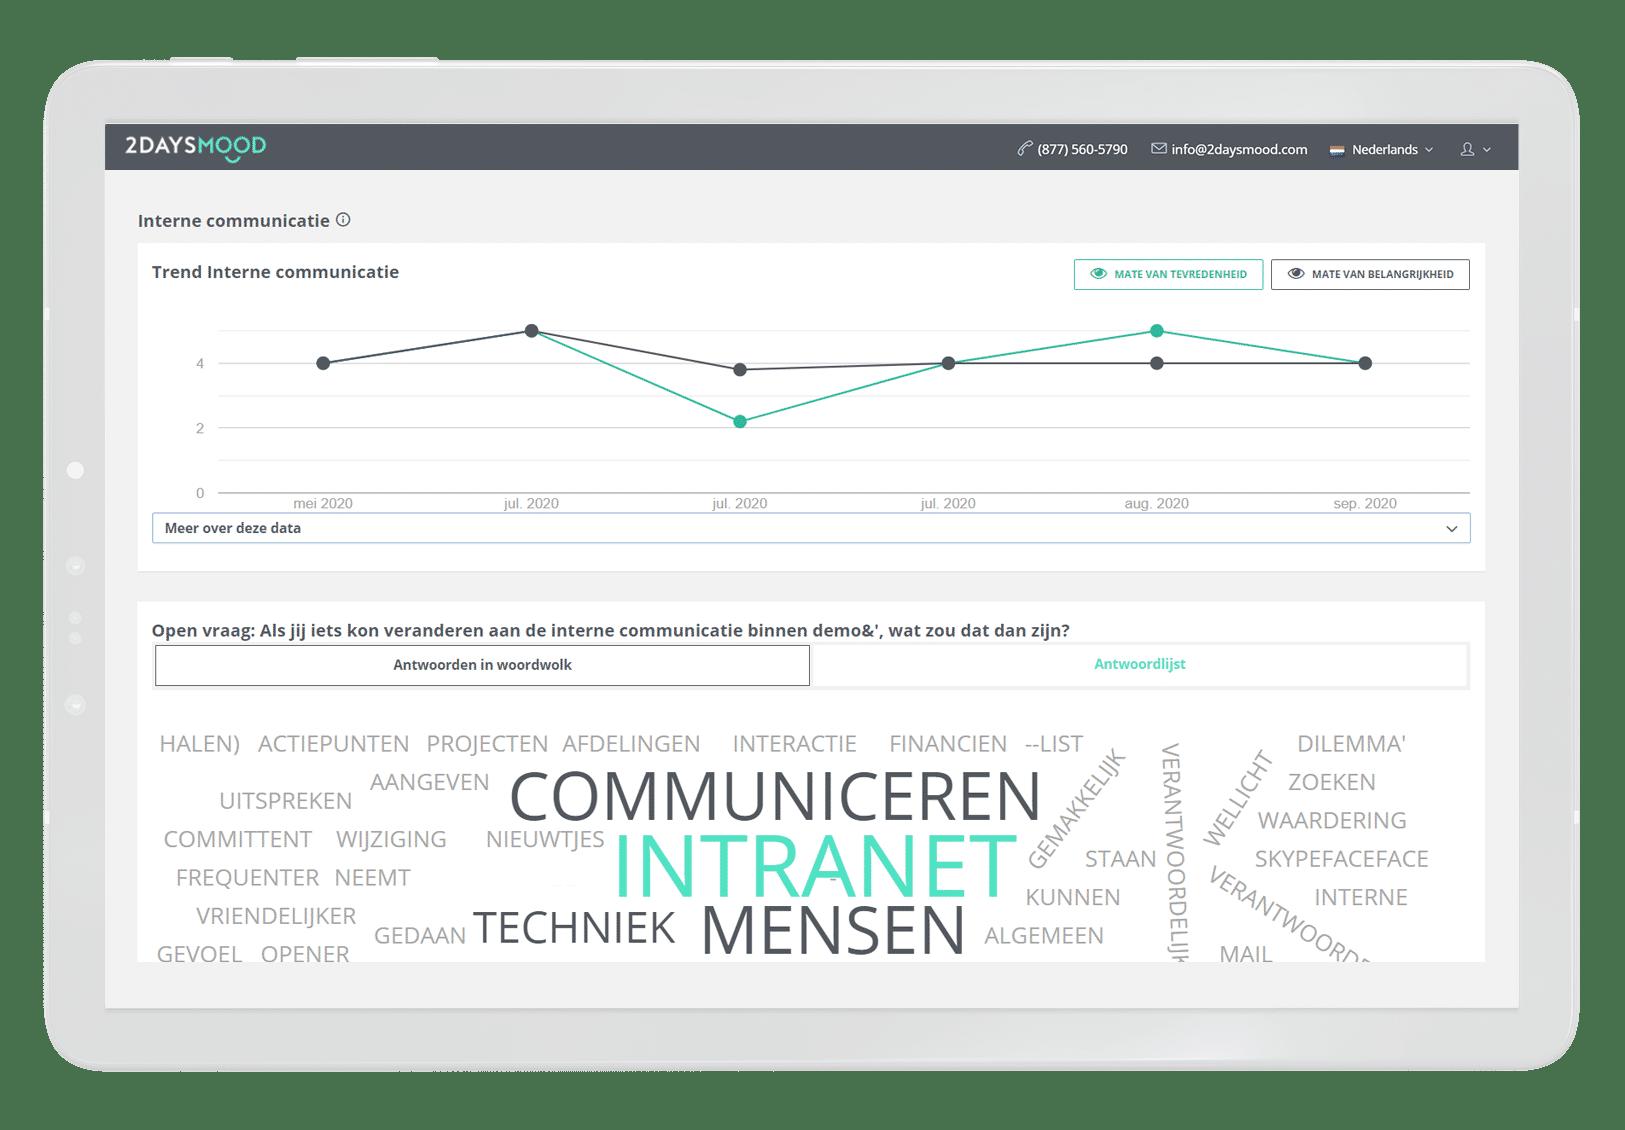 Organisatiecultuur-feedback-tevredenheid-2DAYSMOOD-Tablet-NL